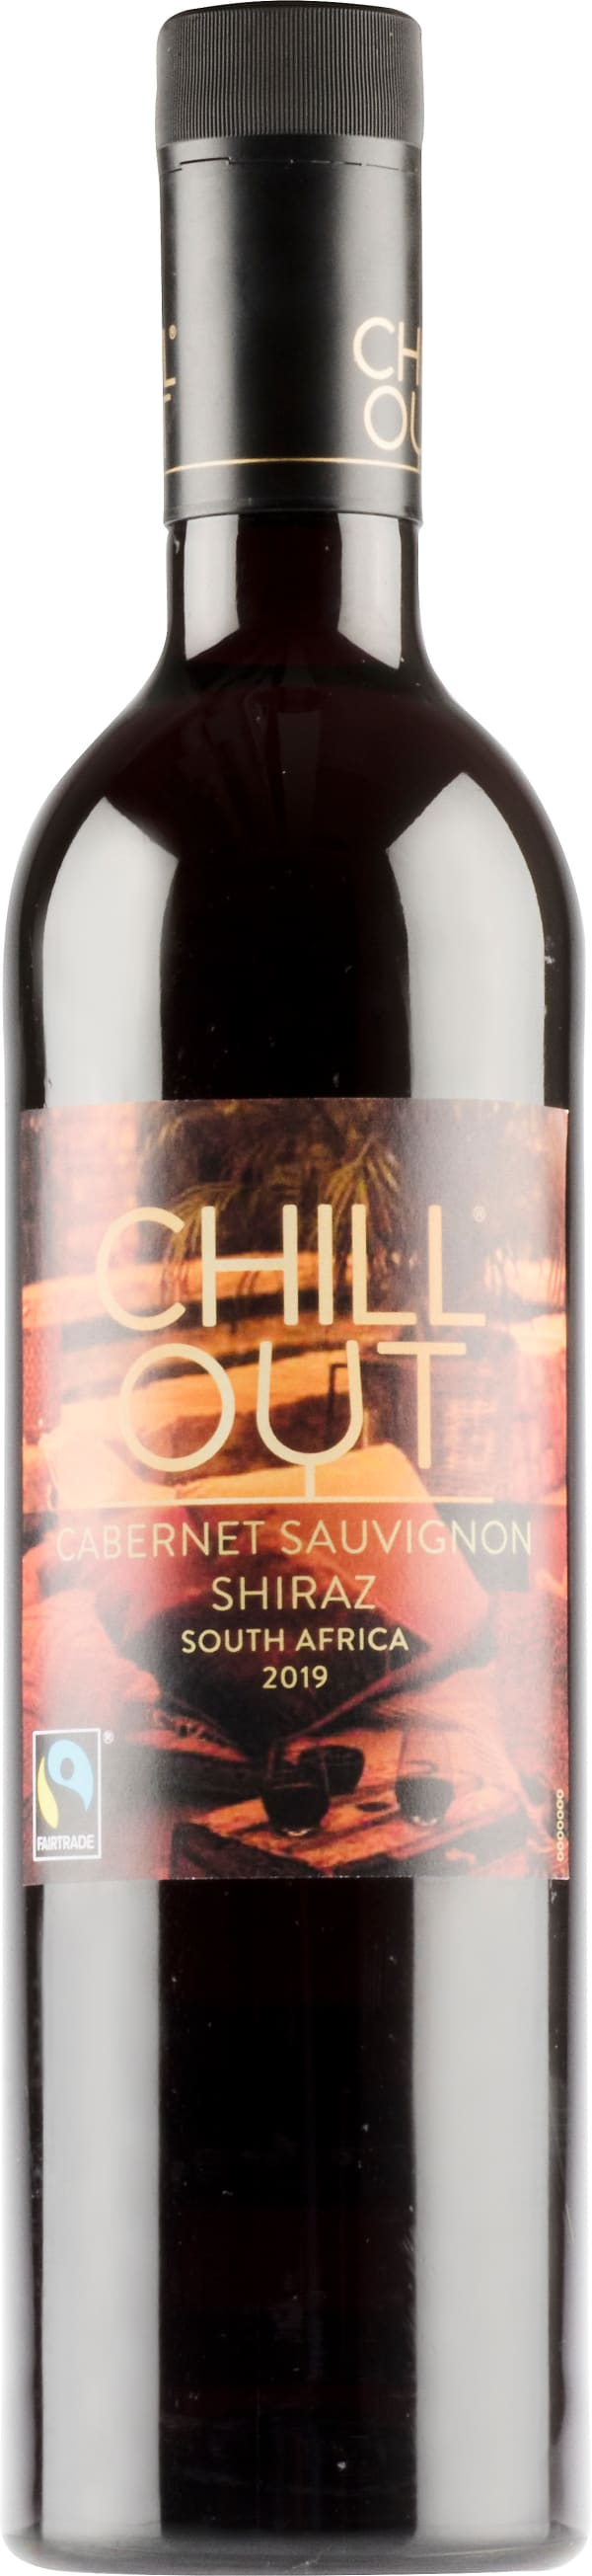 Chill Out Cabernet Sauvignon Shiraz 2020 plastic bottle